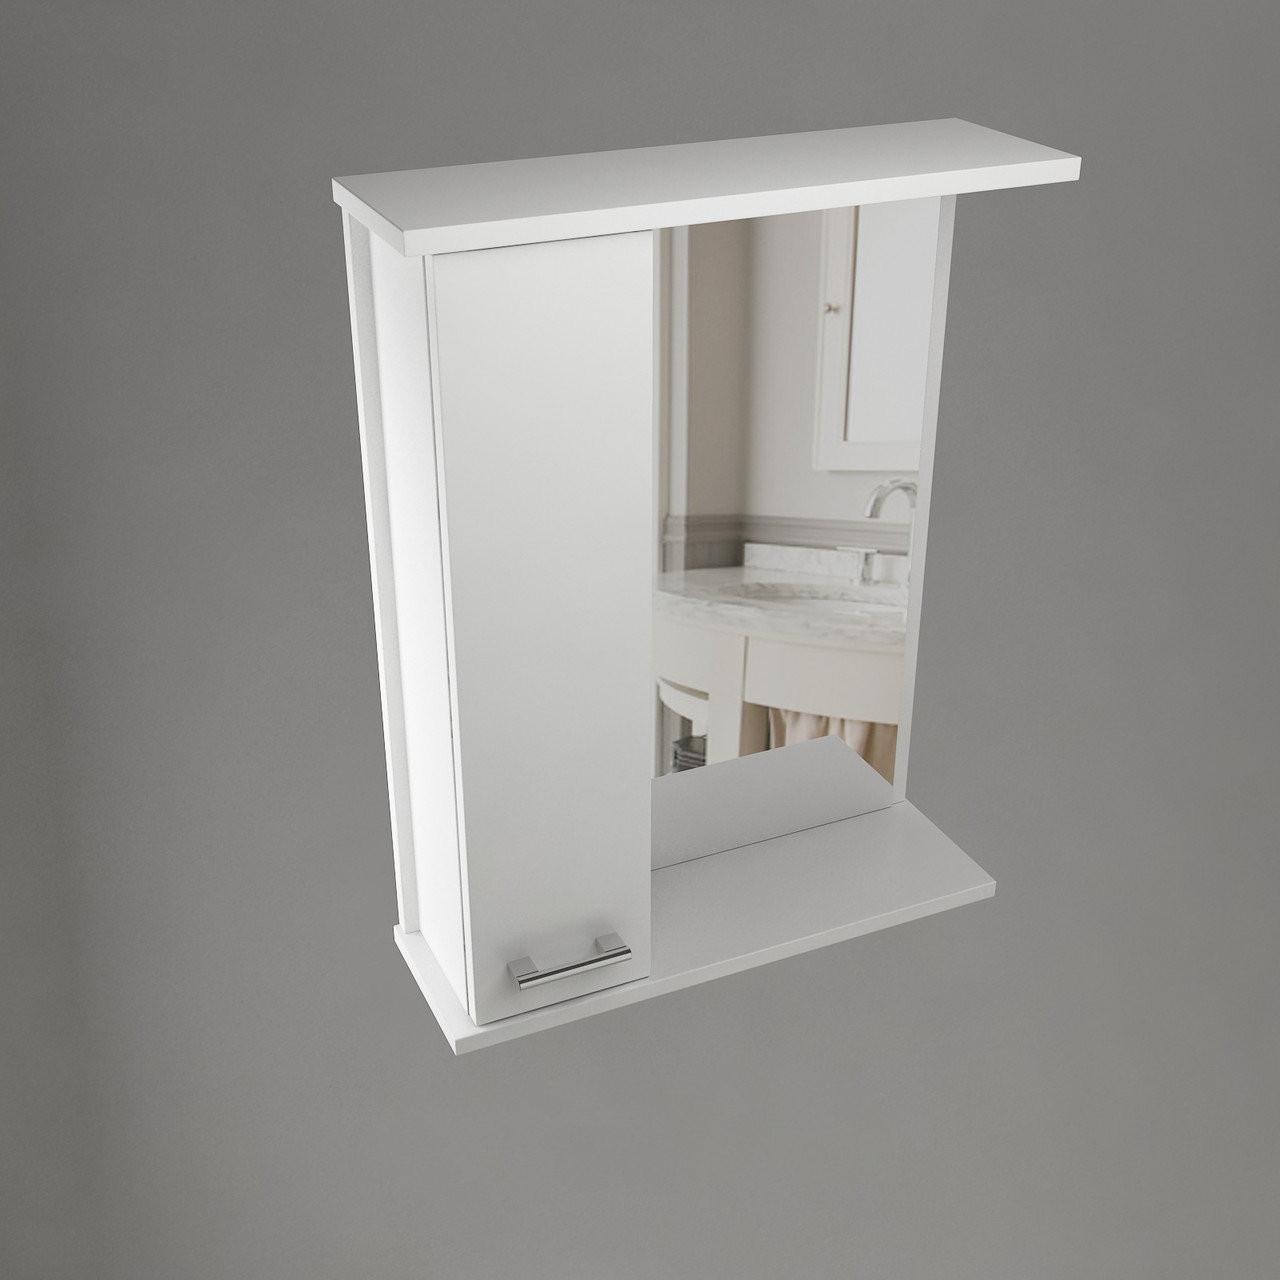 Шкаф навесной Water World, 1 дверь + зеркало, 500,50*70*17 (Стиль, Белый снег, Молочный глянец)(4603750000000)